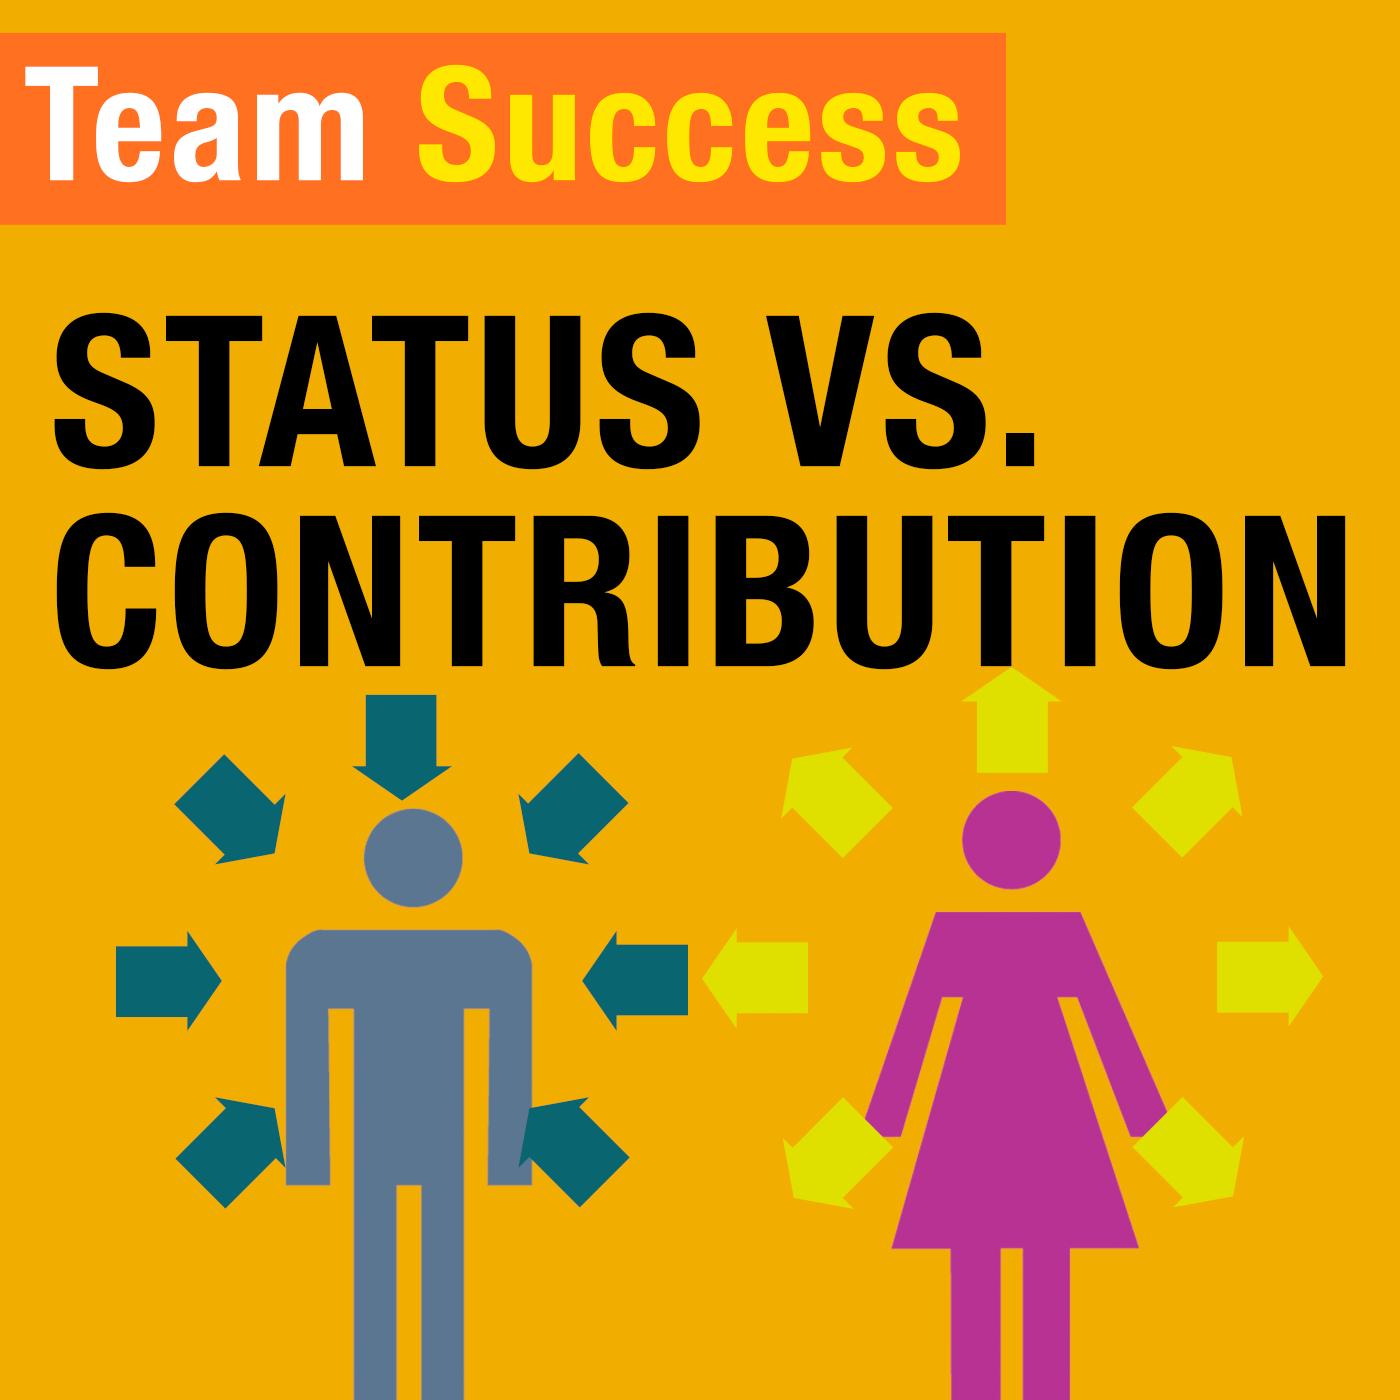 Status vs. Contribution